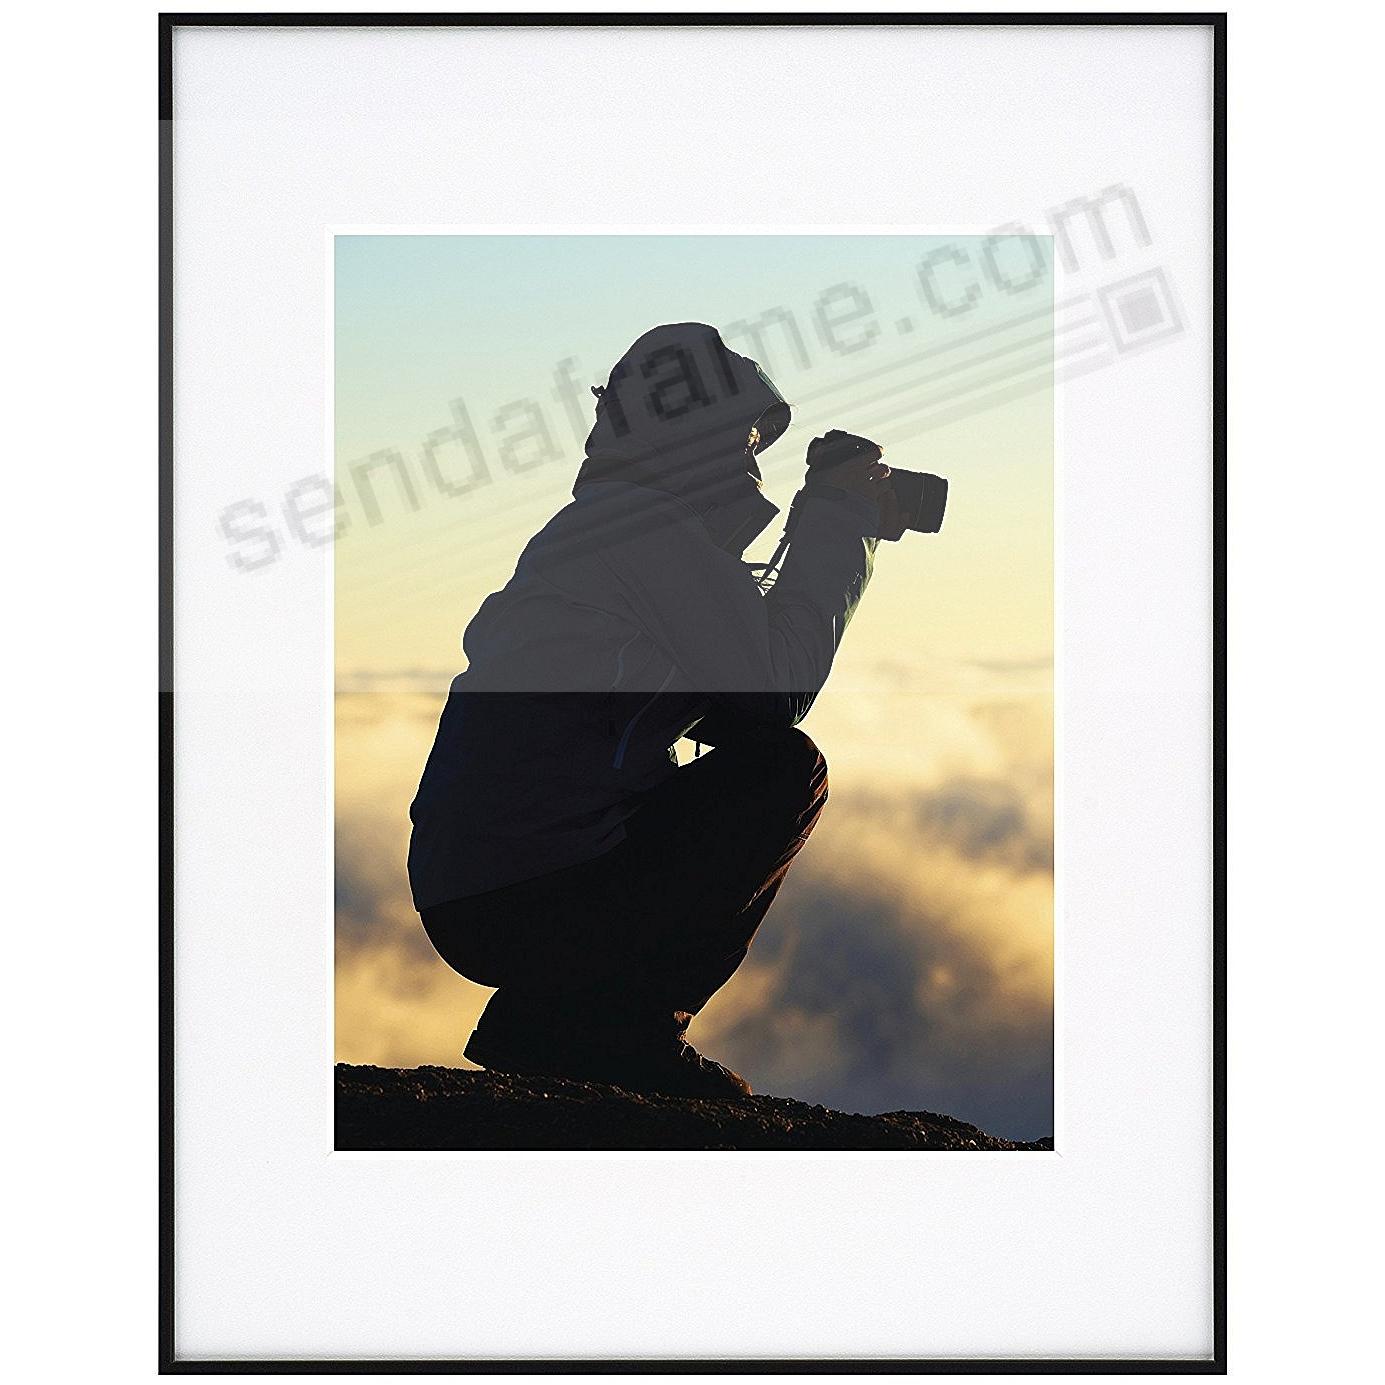 Photography Metallic Frame Black White Matted 11x14 8x10